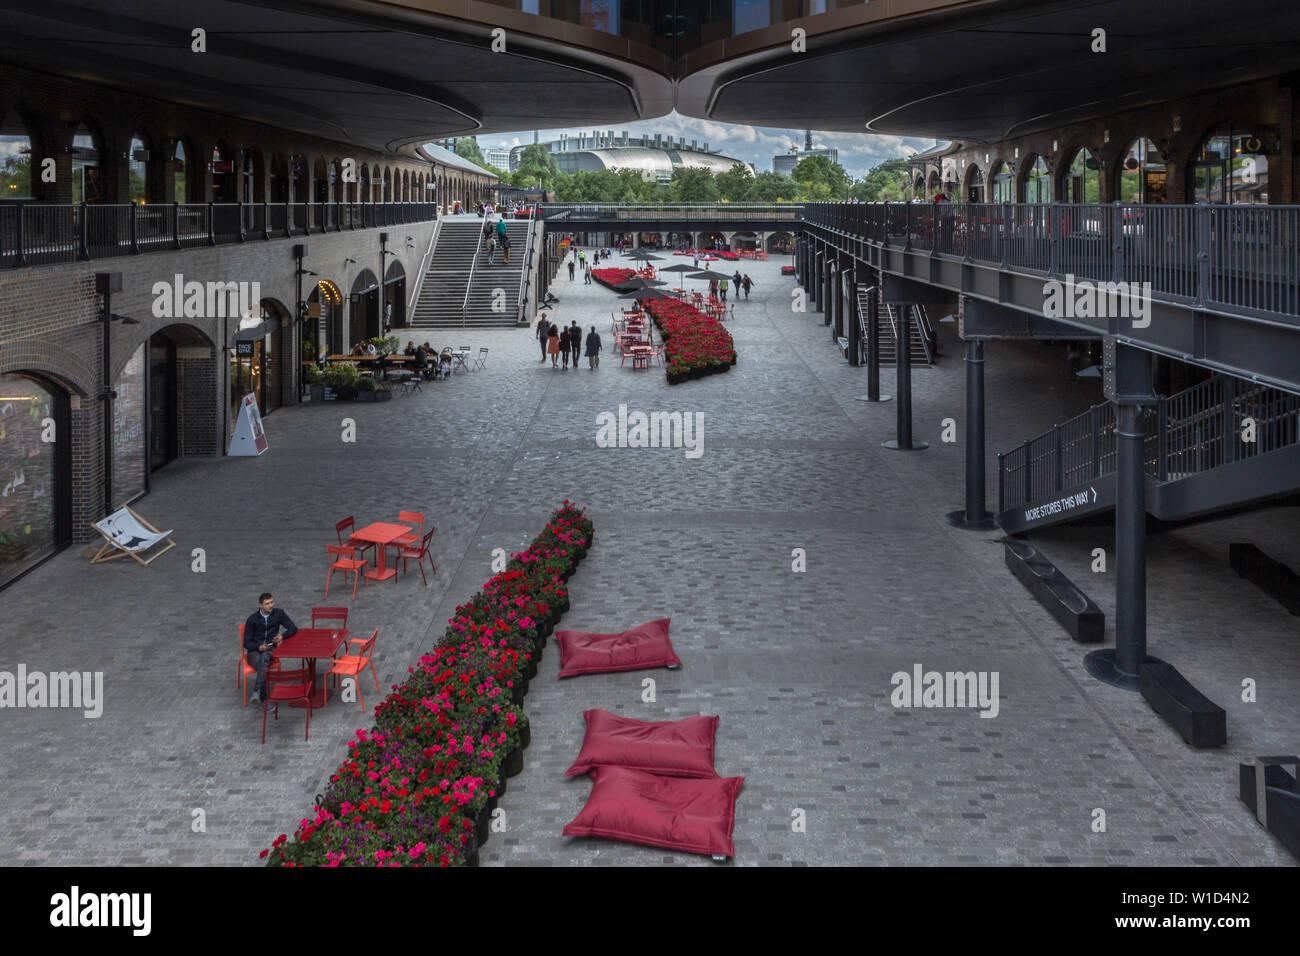 Shopping Center near Granary Square - Stock Image